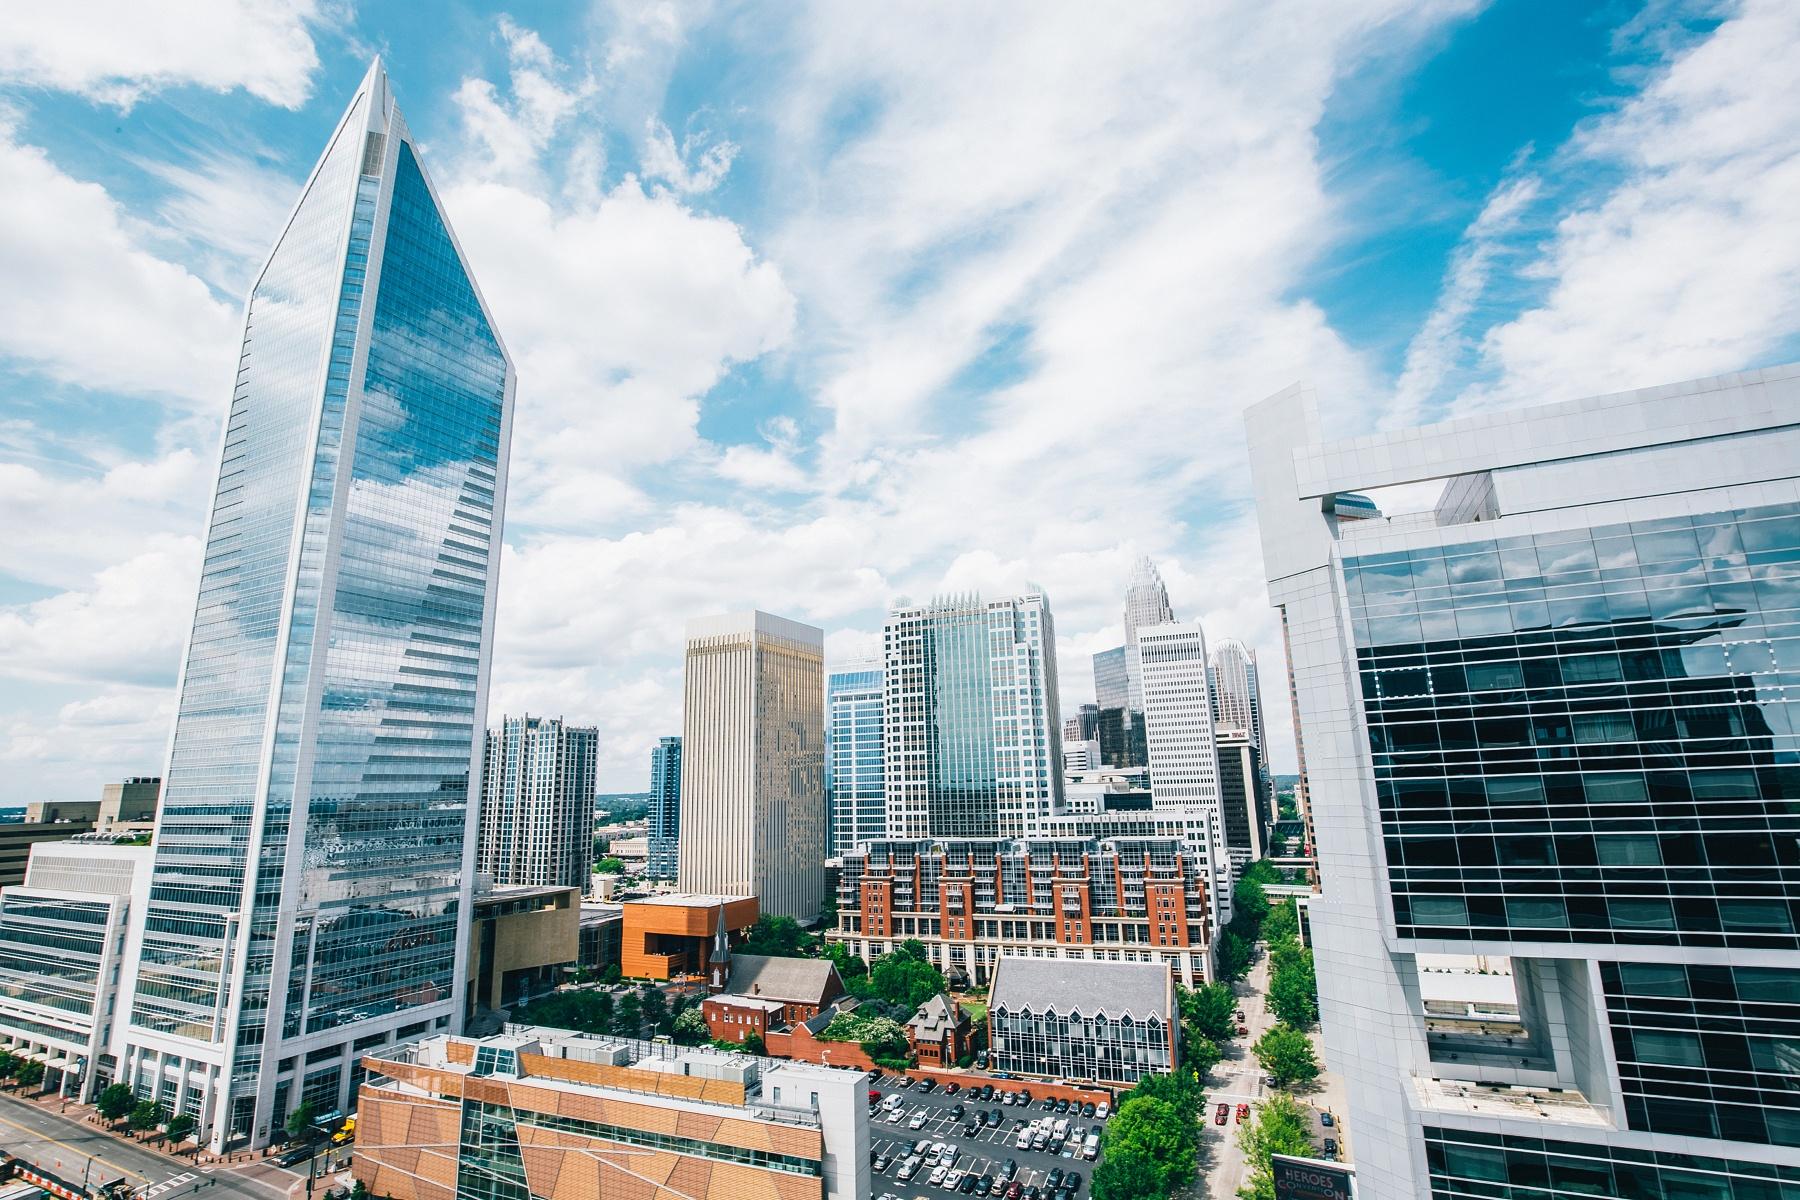 Charlotte city photo